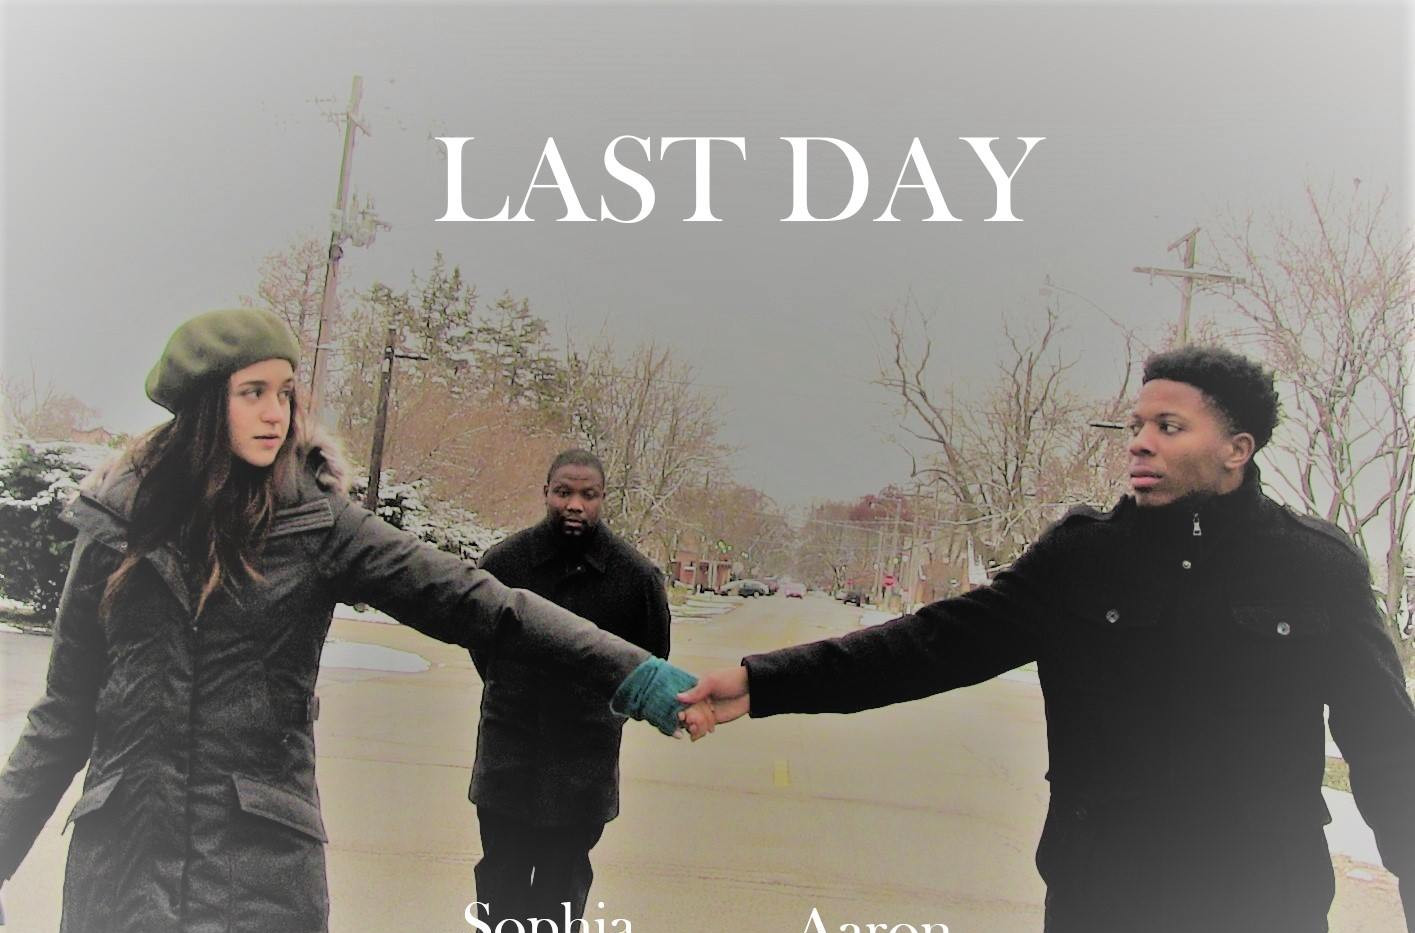 Last Day Film Poster